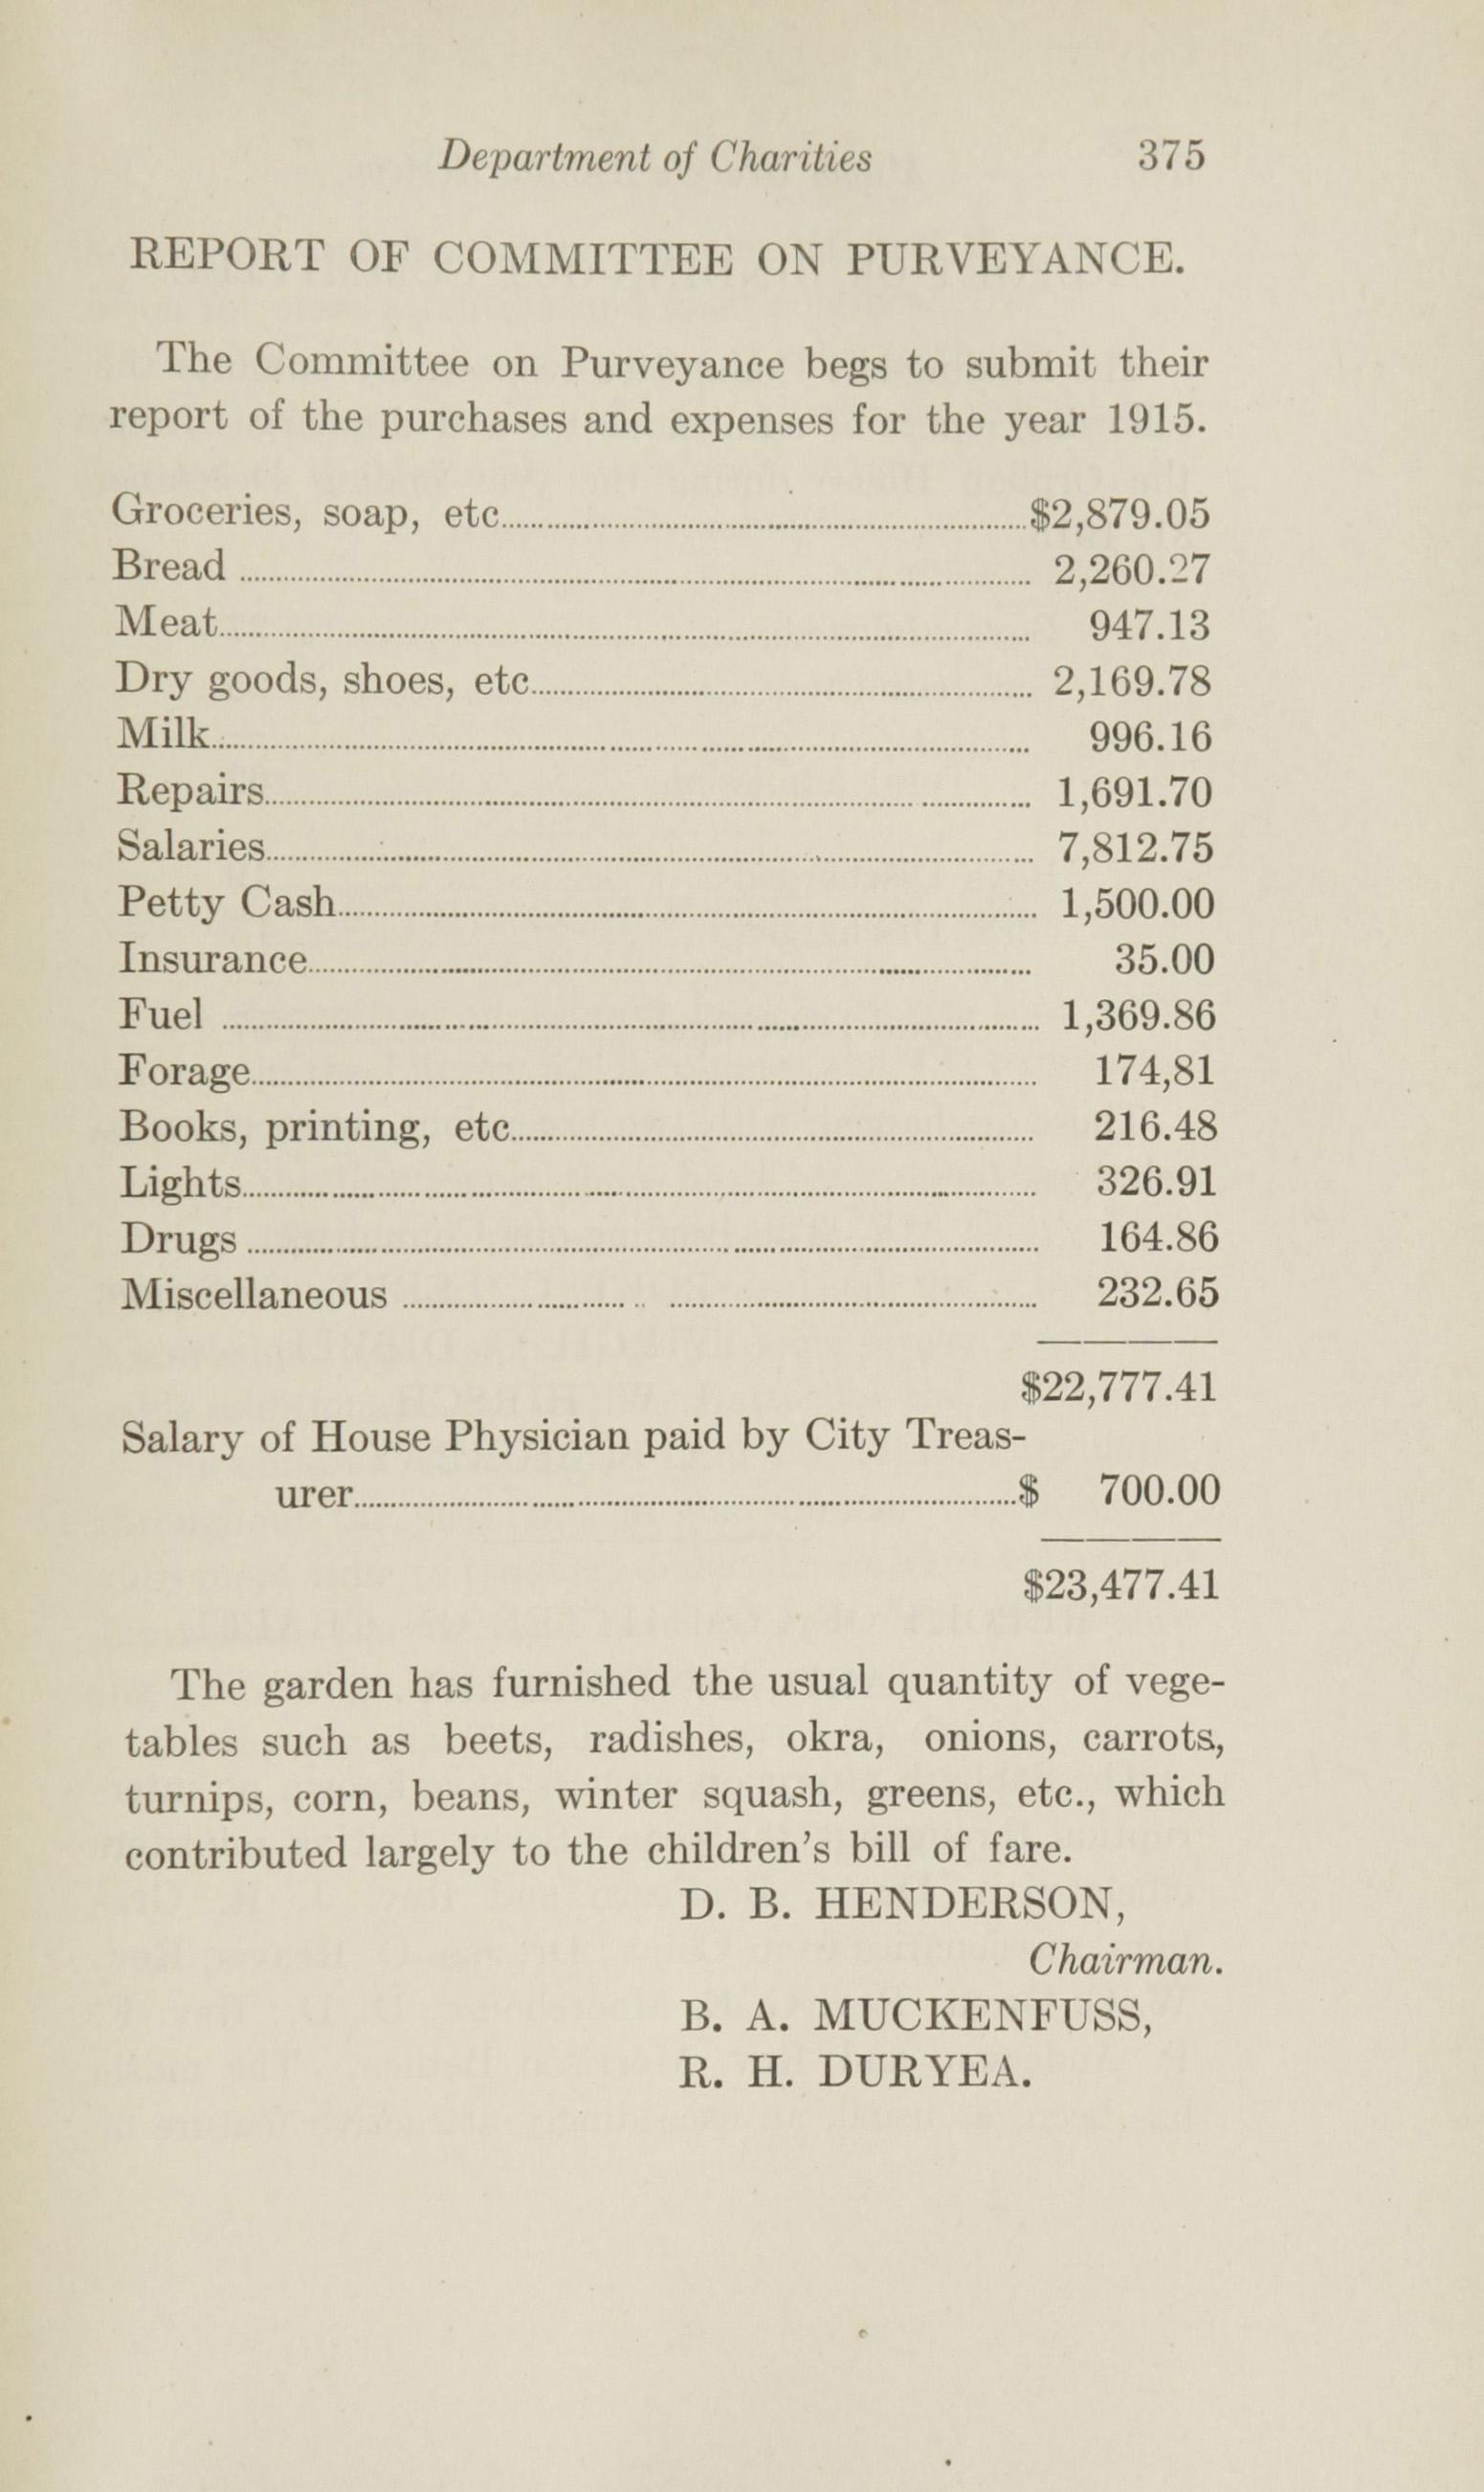 Charleston Yearbook, 1915, page 375